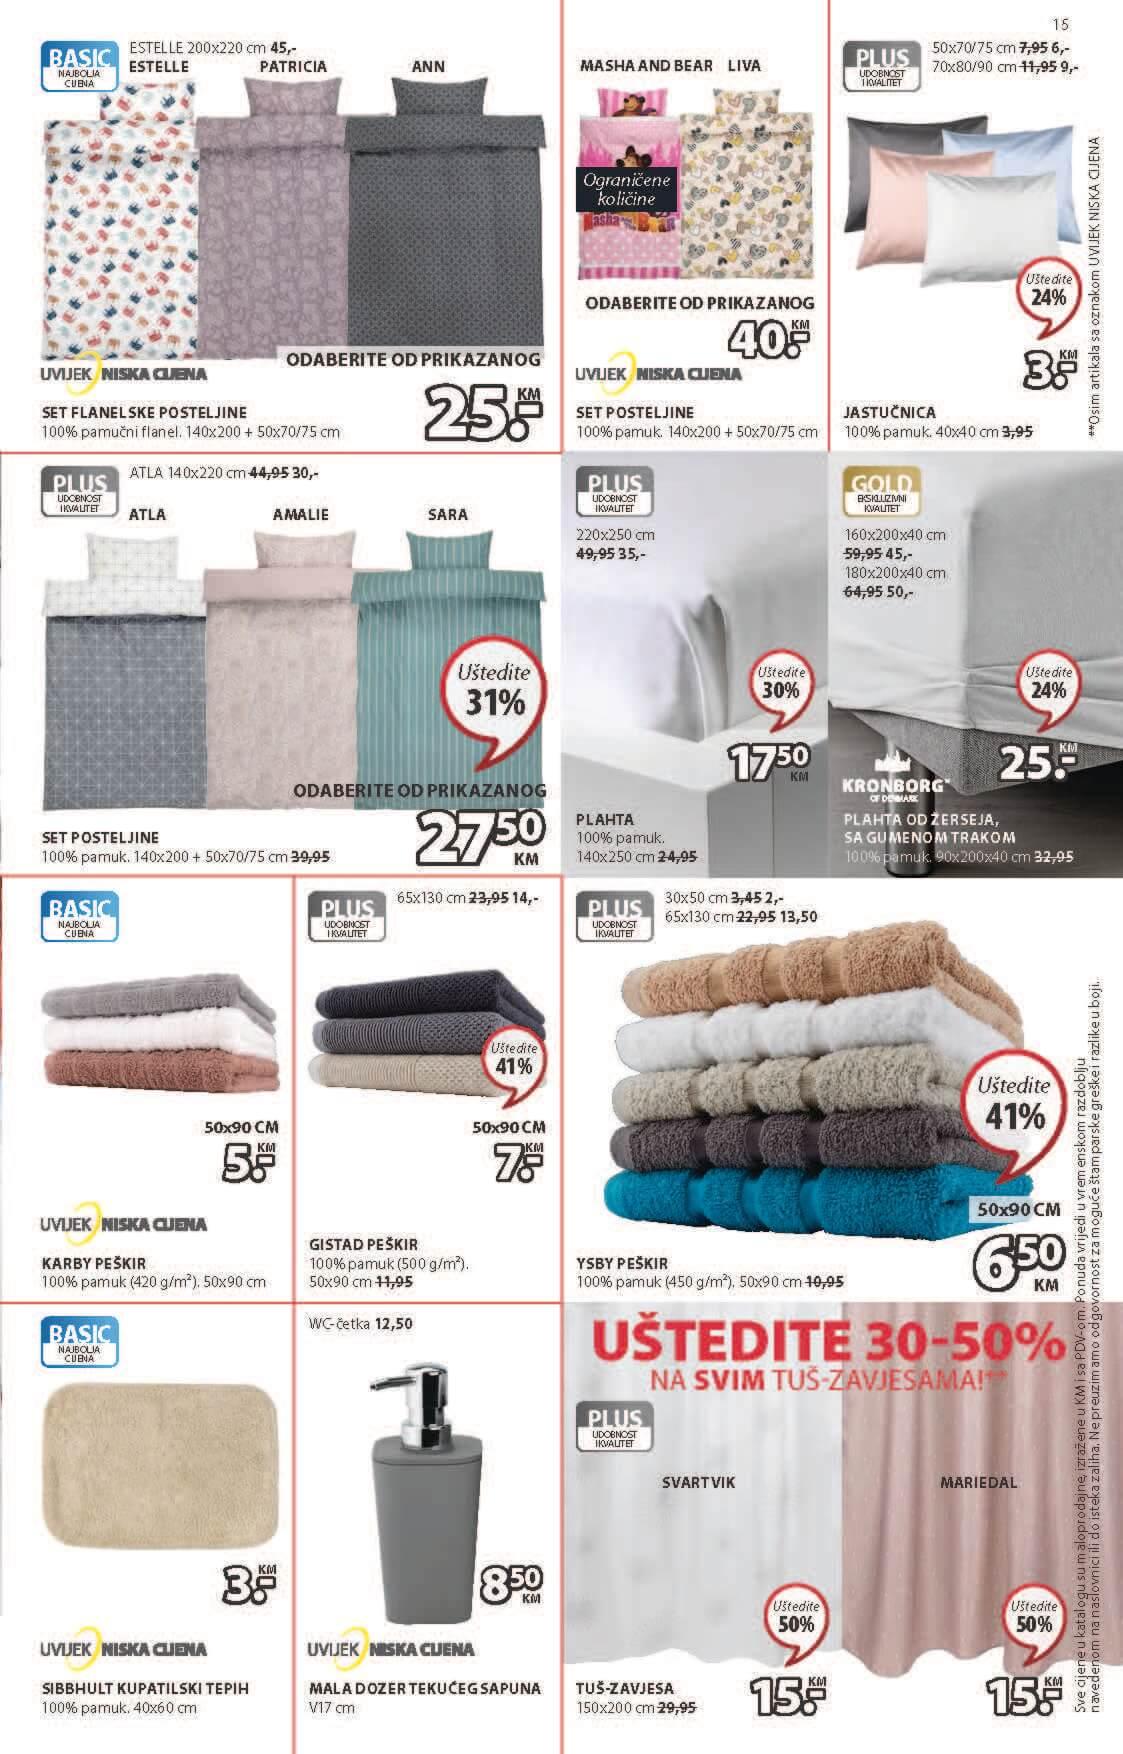 JYSK Katalog Ljetna RASPRODAJA JUN 2021 17.6. 30.6. ekatalozi.com PR Page 16